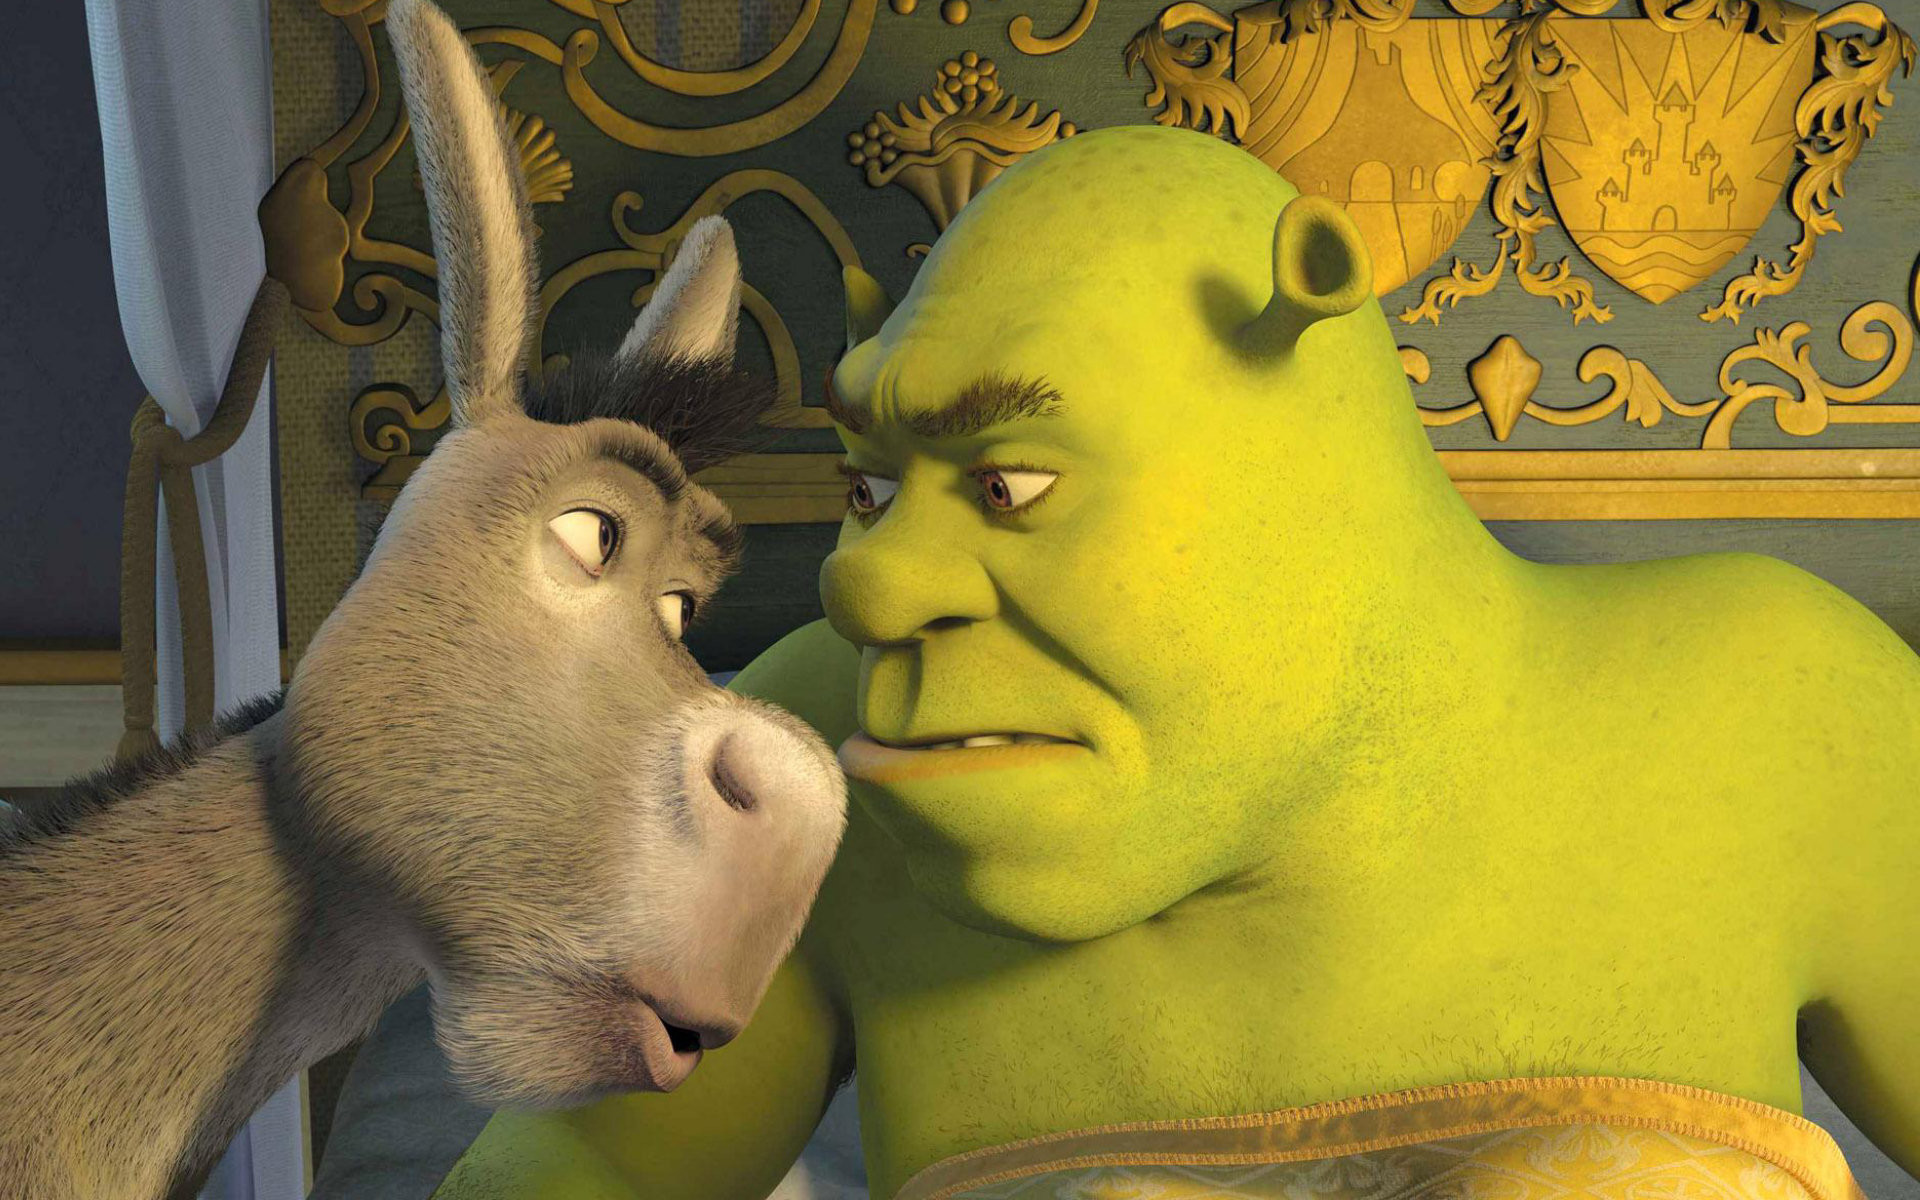 Shrek and Donkey HD desktop wallpaper Widescreen High | Wallpapers For  Desktop | Pinterest | Shrek and Wallpaper